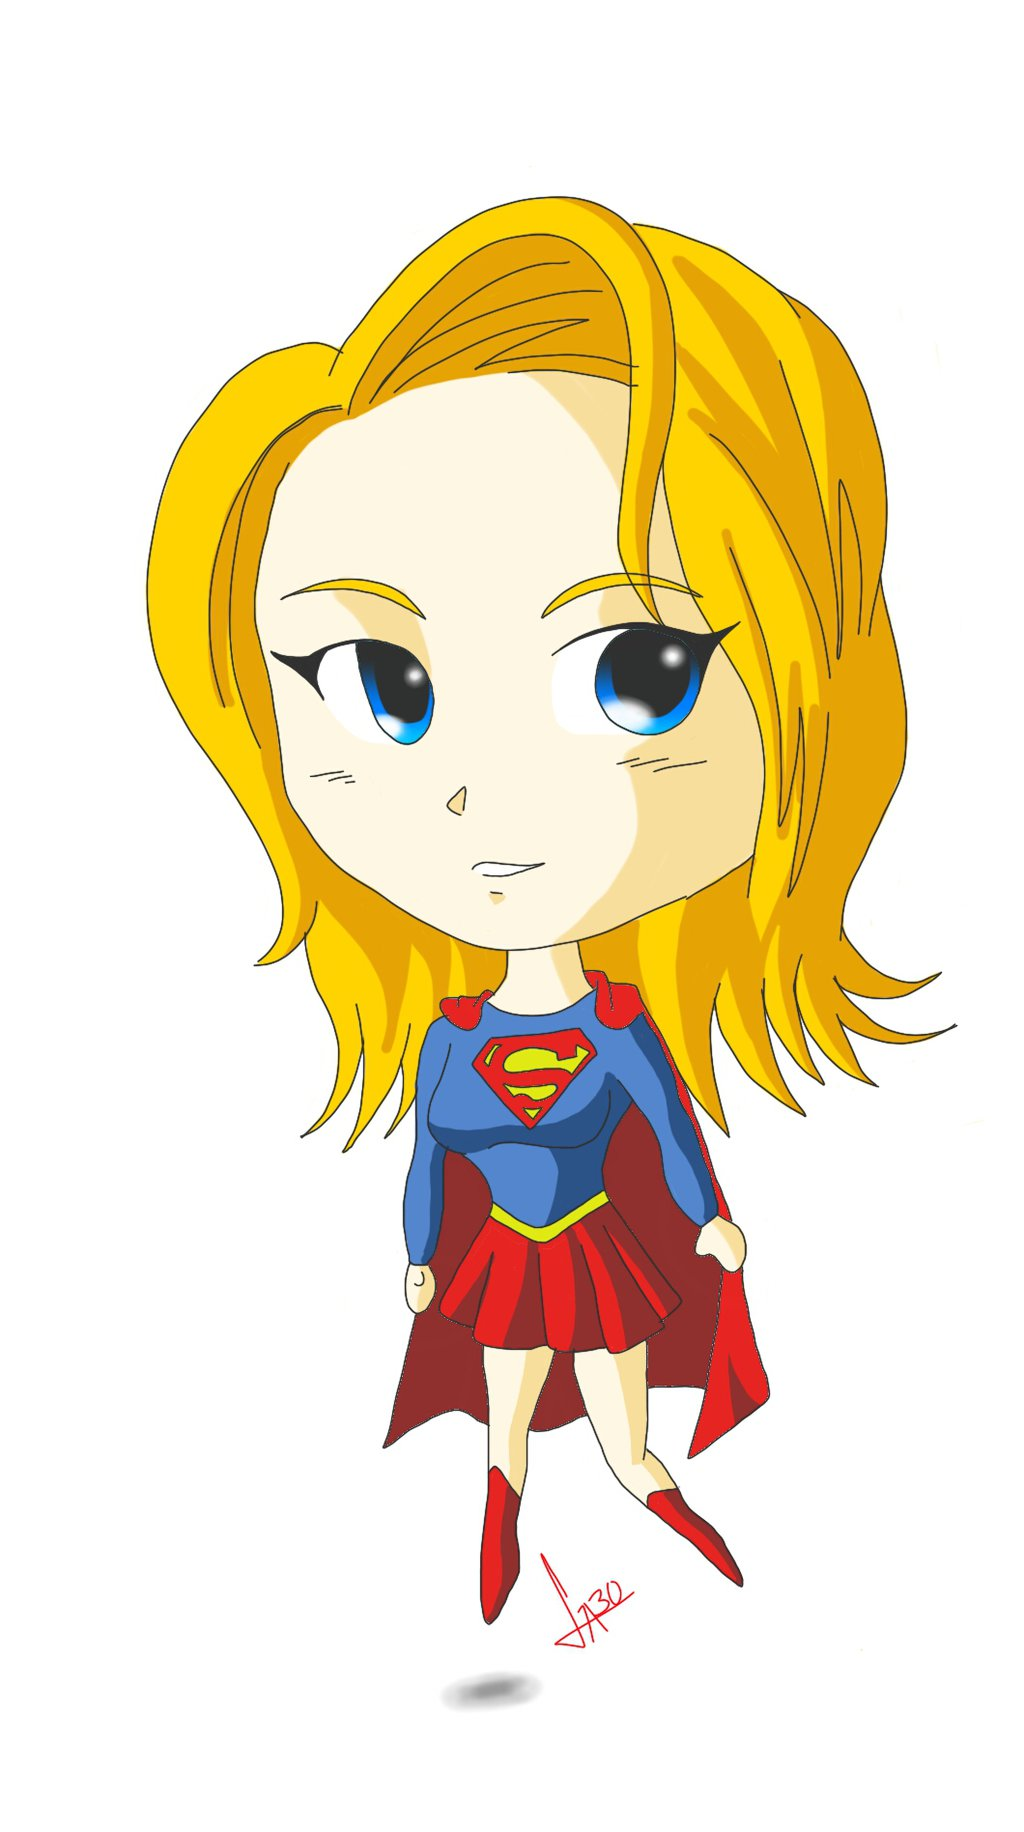 Super Girl clipart chibi GABOND12 GABOND12 style on style